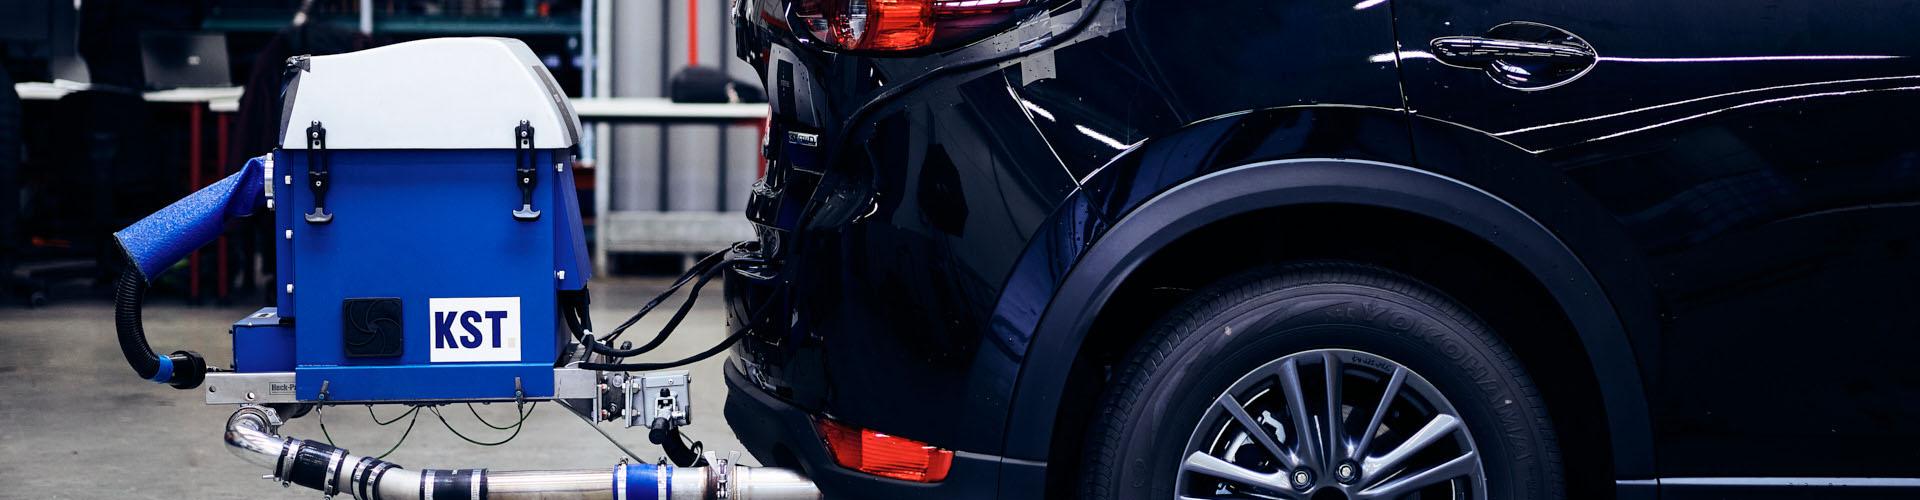 Abgas-Emission PKW